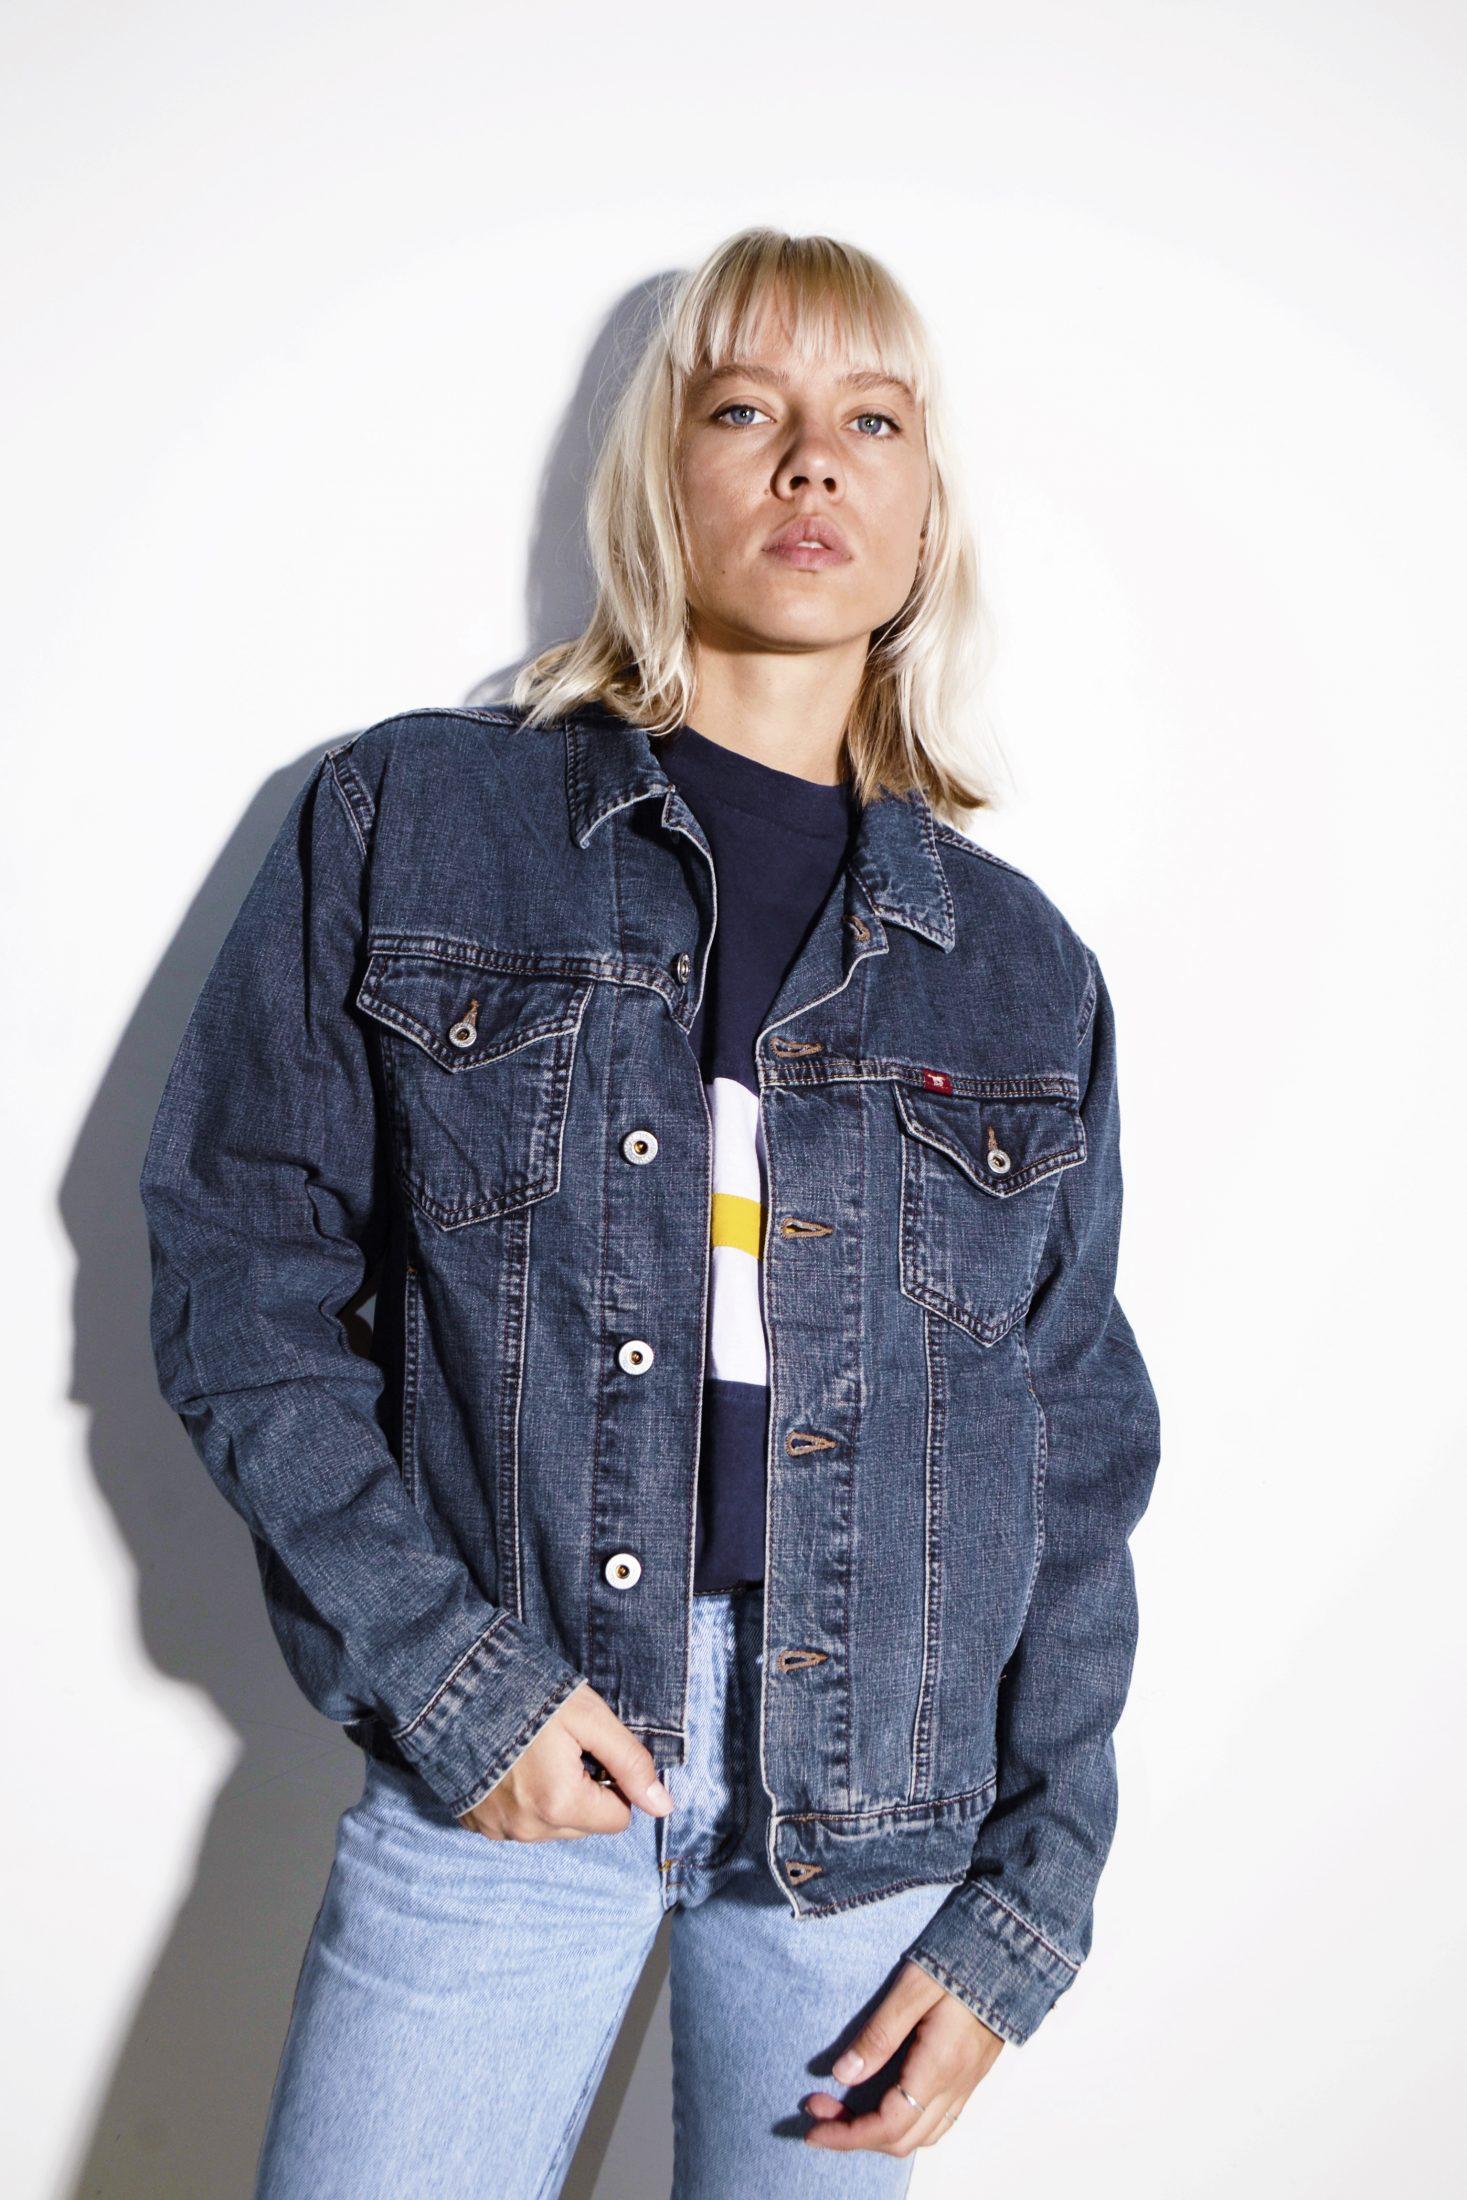 a6d2ea5e8 MUSTANG vintage denim jacket